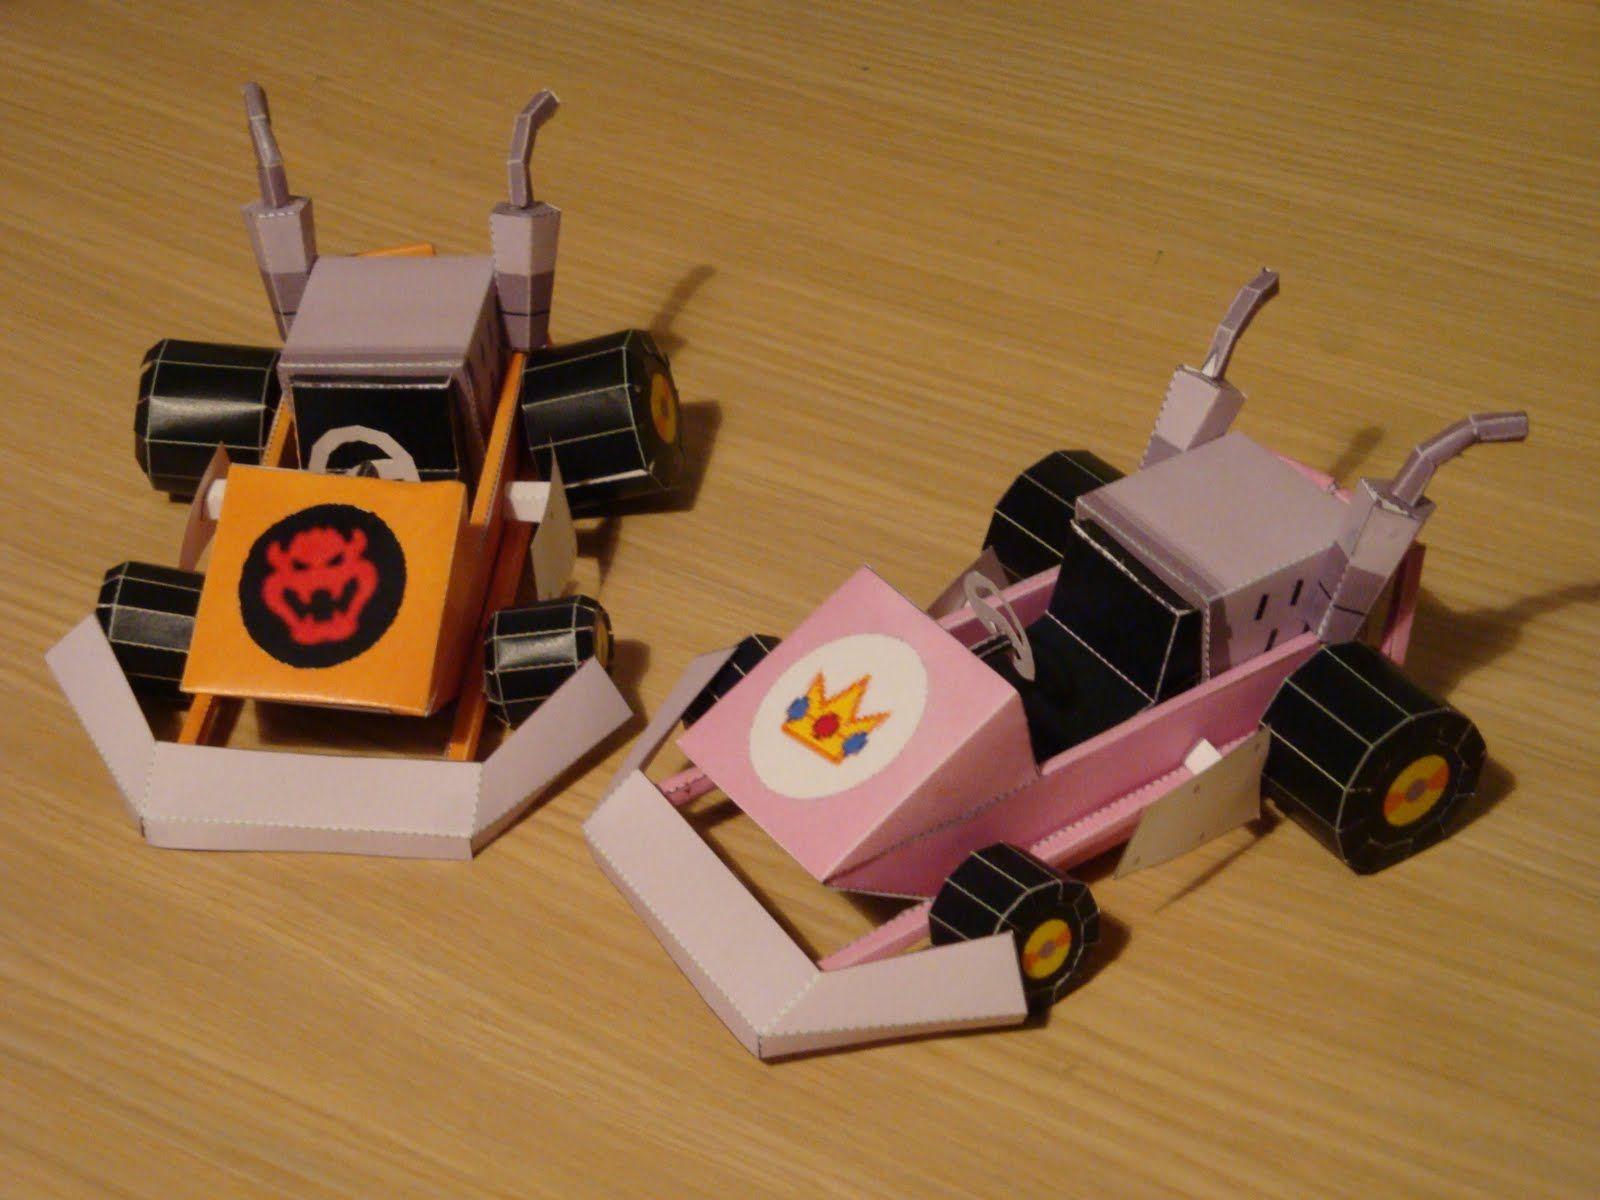 Mario Kart Bowser And Peach Kart Free Paper Models Paper Models Paper Crafts